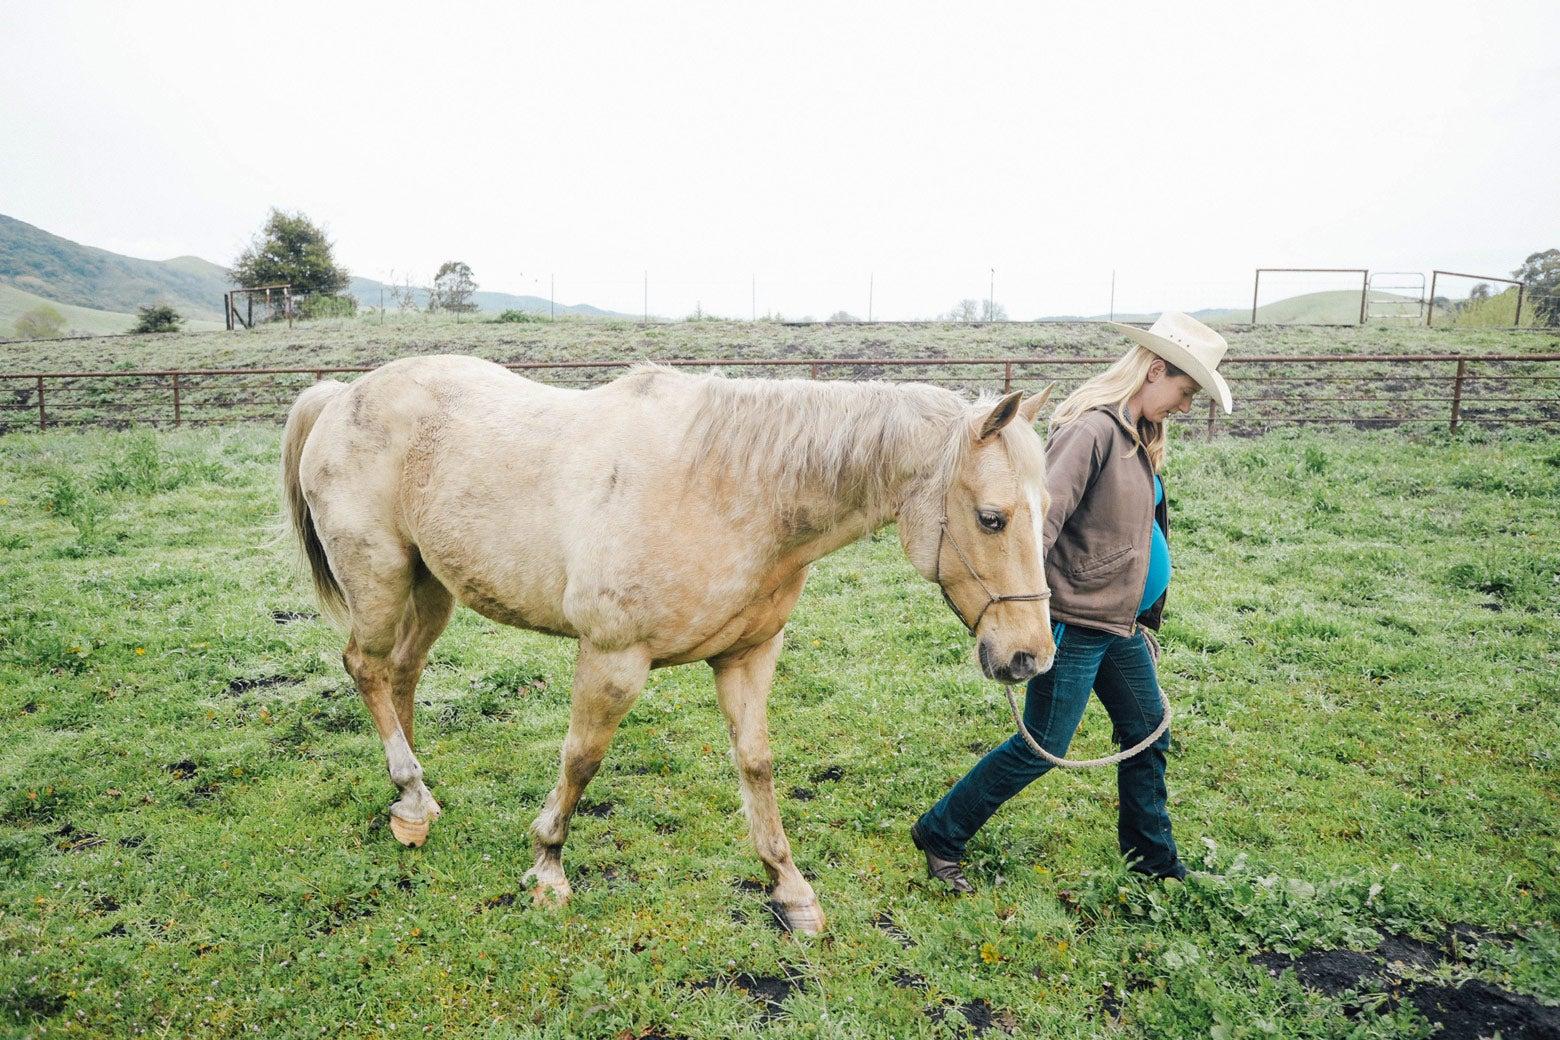 Elizabeth leads a horse through a field.